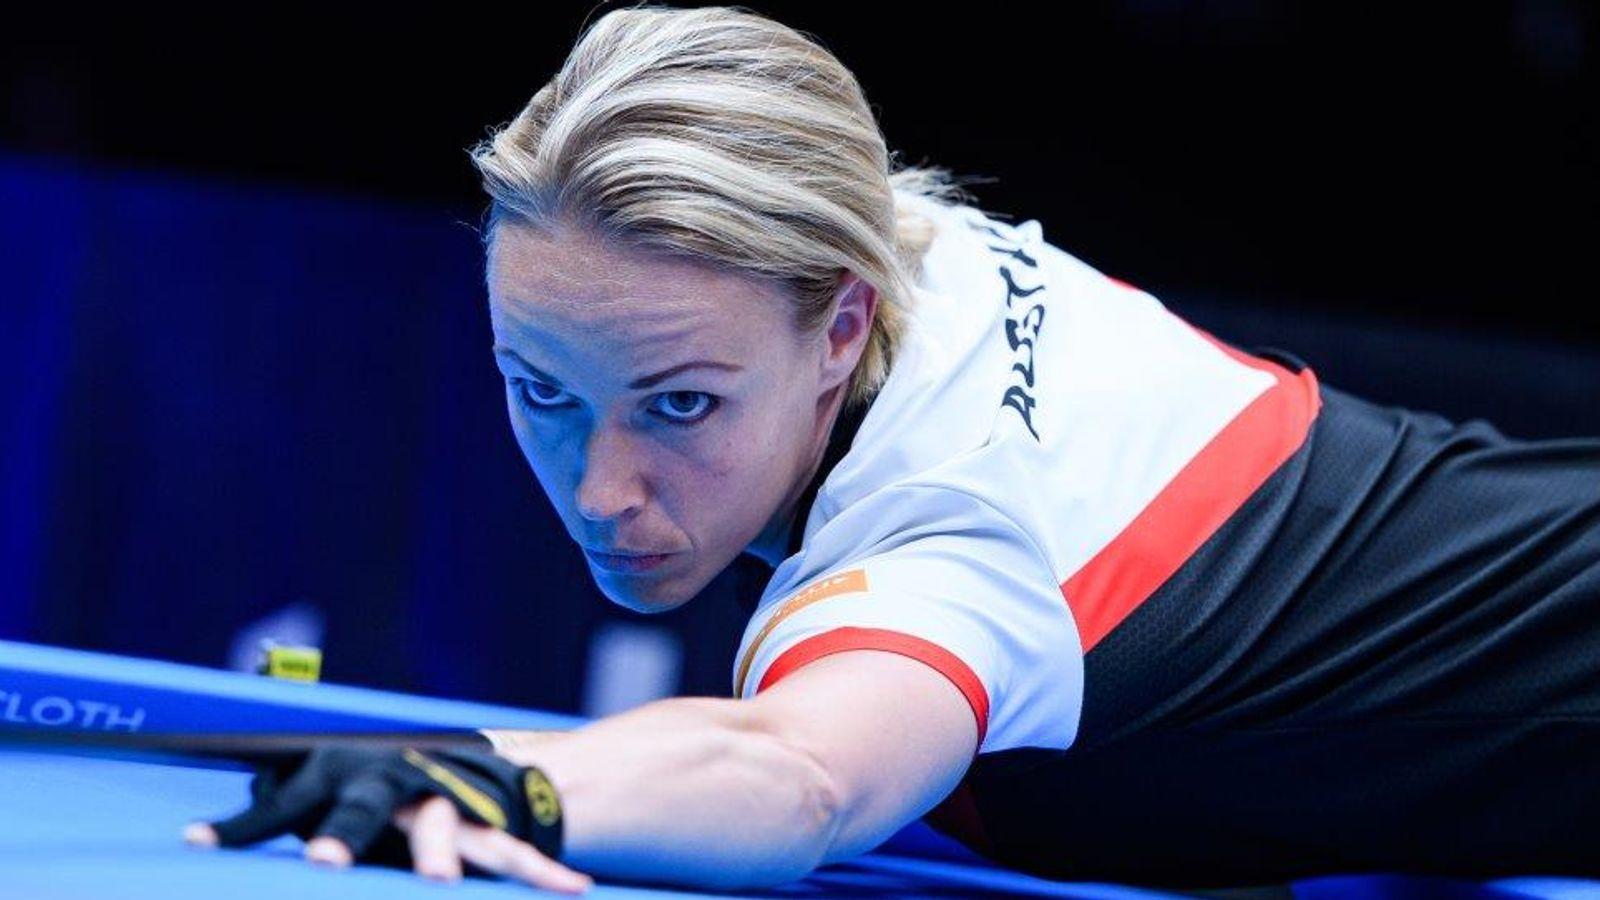 World Pool Championship: Kelly Fisher, Veronika Ivanovskaia and Jasmin Ouschan through to last 64